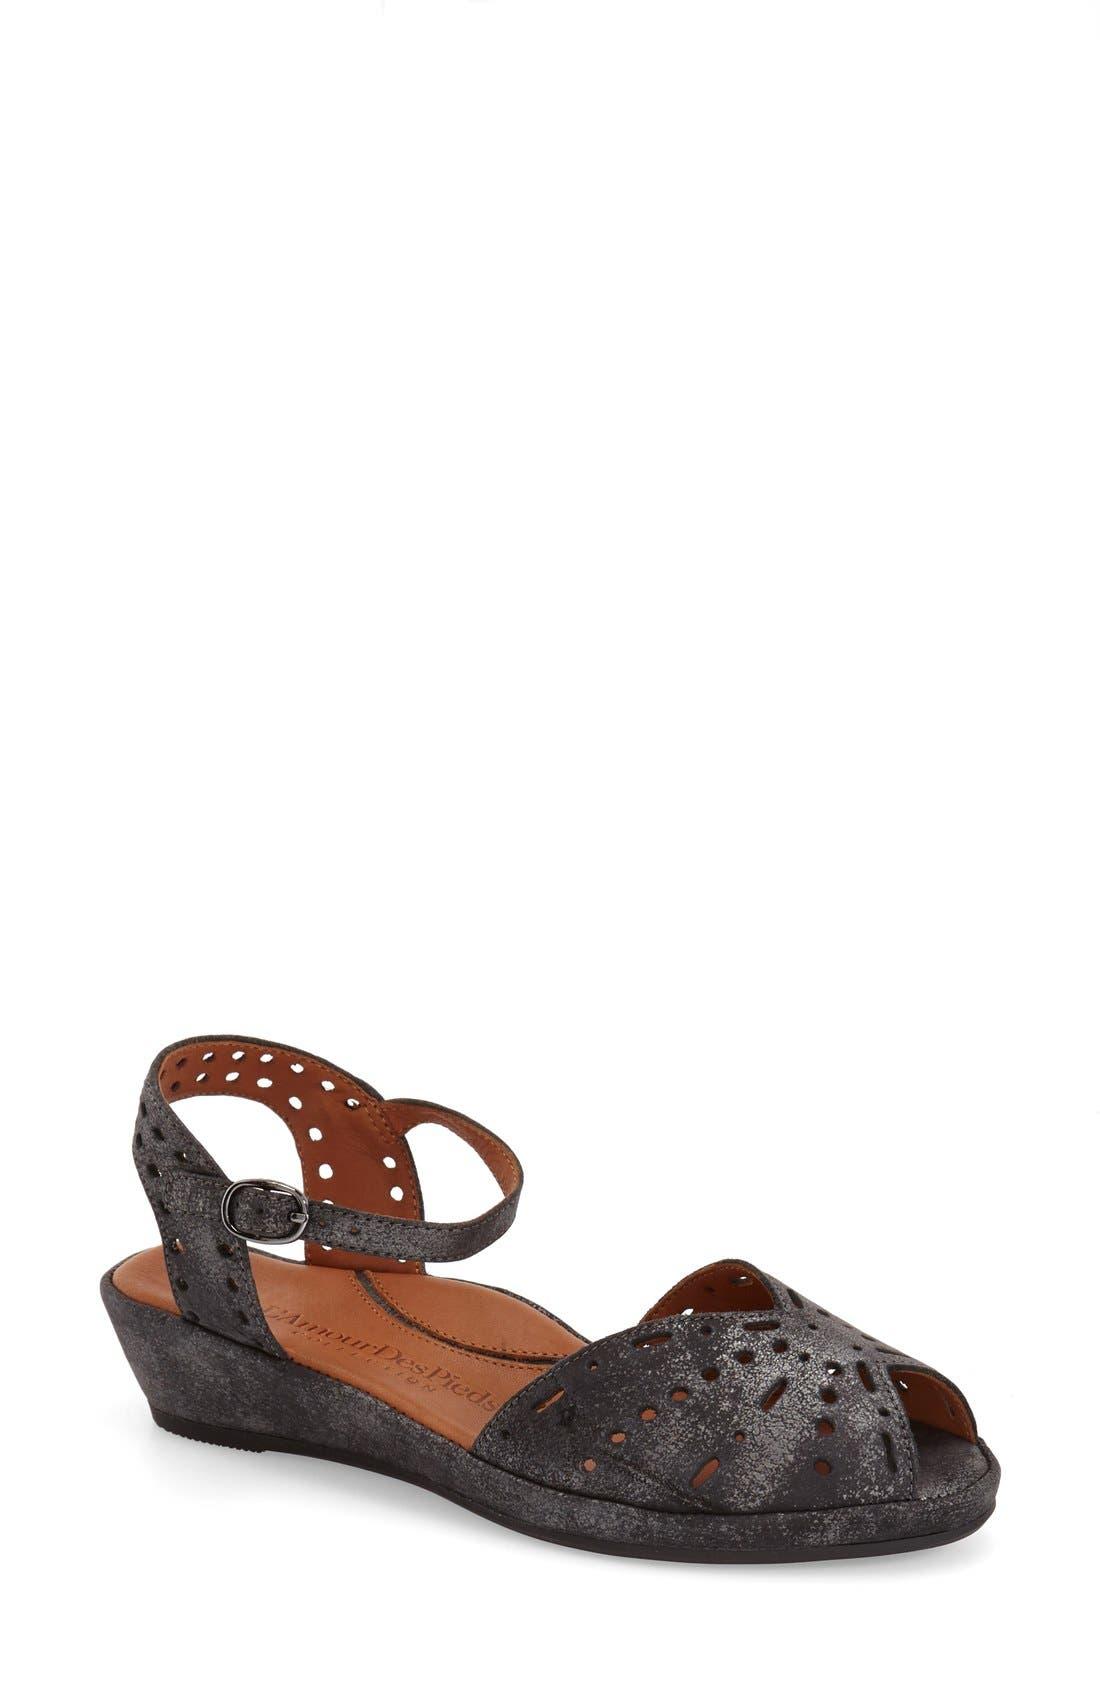 'Brenn' Ankle Strap Sandal,                         Main,                         color, Graphite Leather